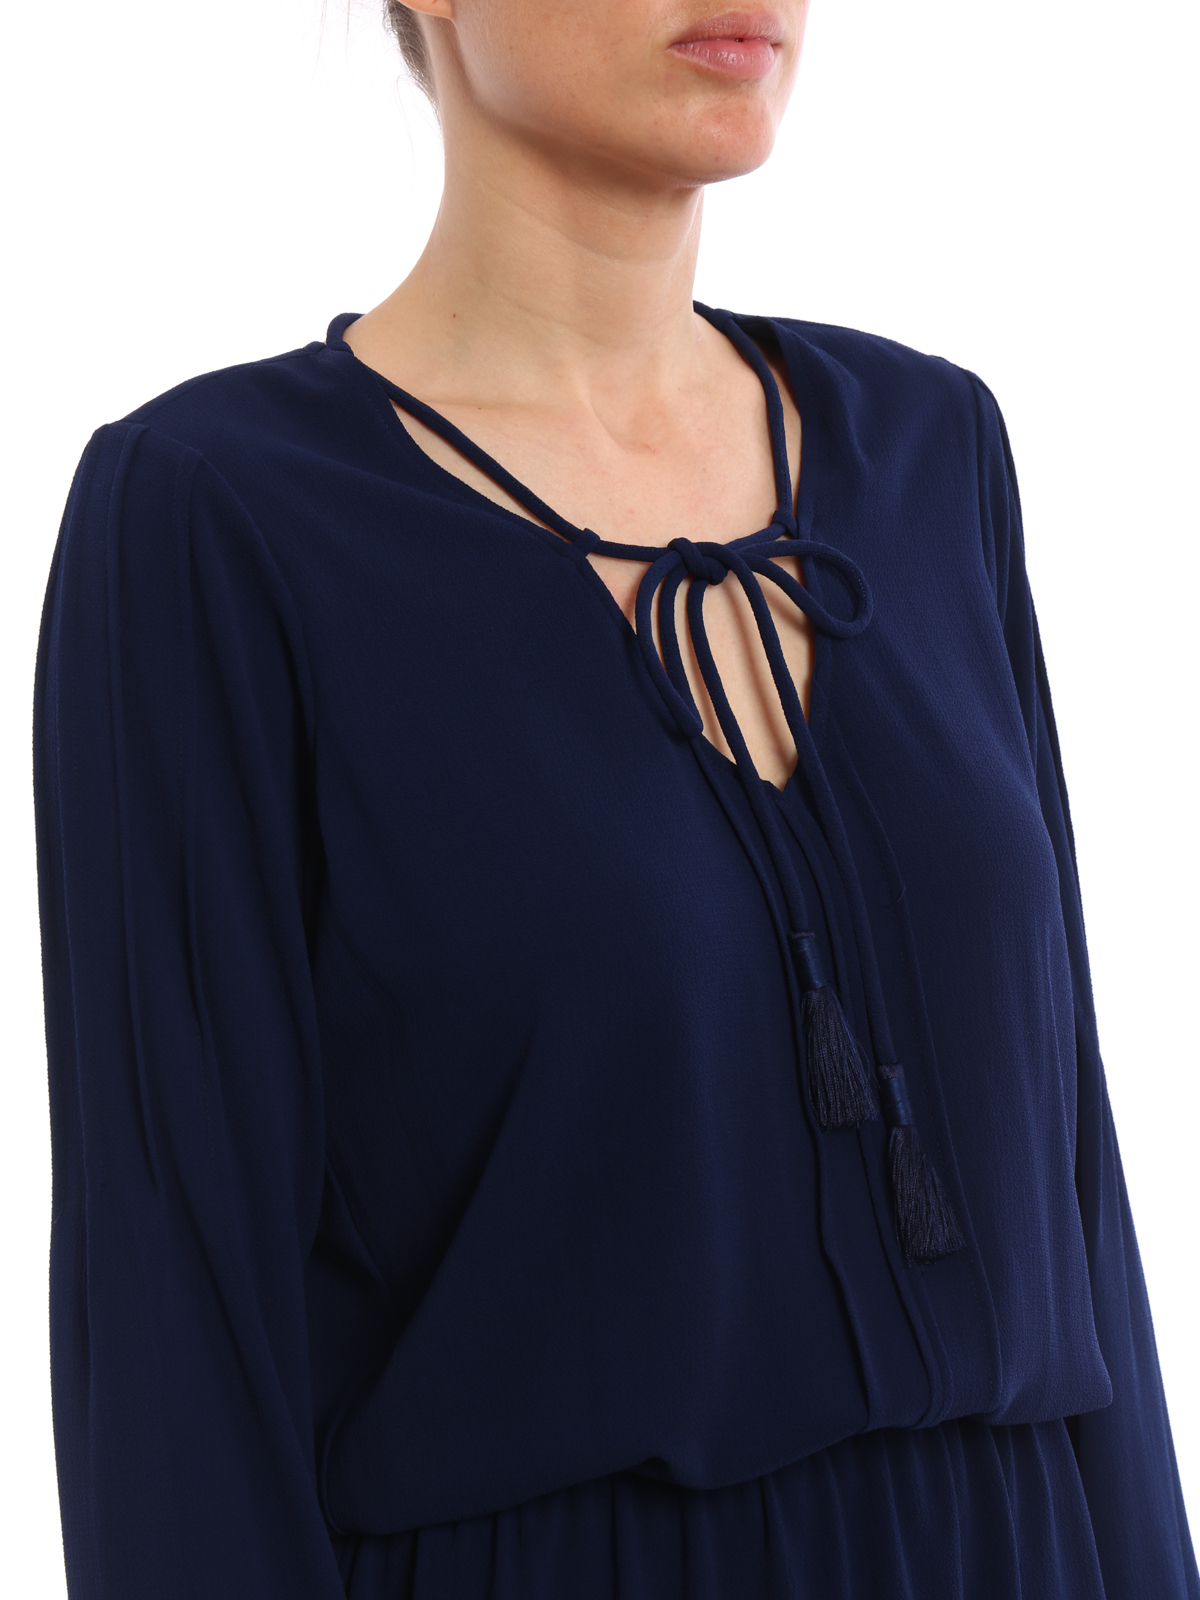 2a073fea3 MICHAEL KORS buy online Vestido Corto Azul Oscuro · MICHAEL KORS  Vestidos  cortos ...